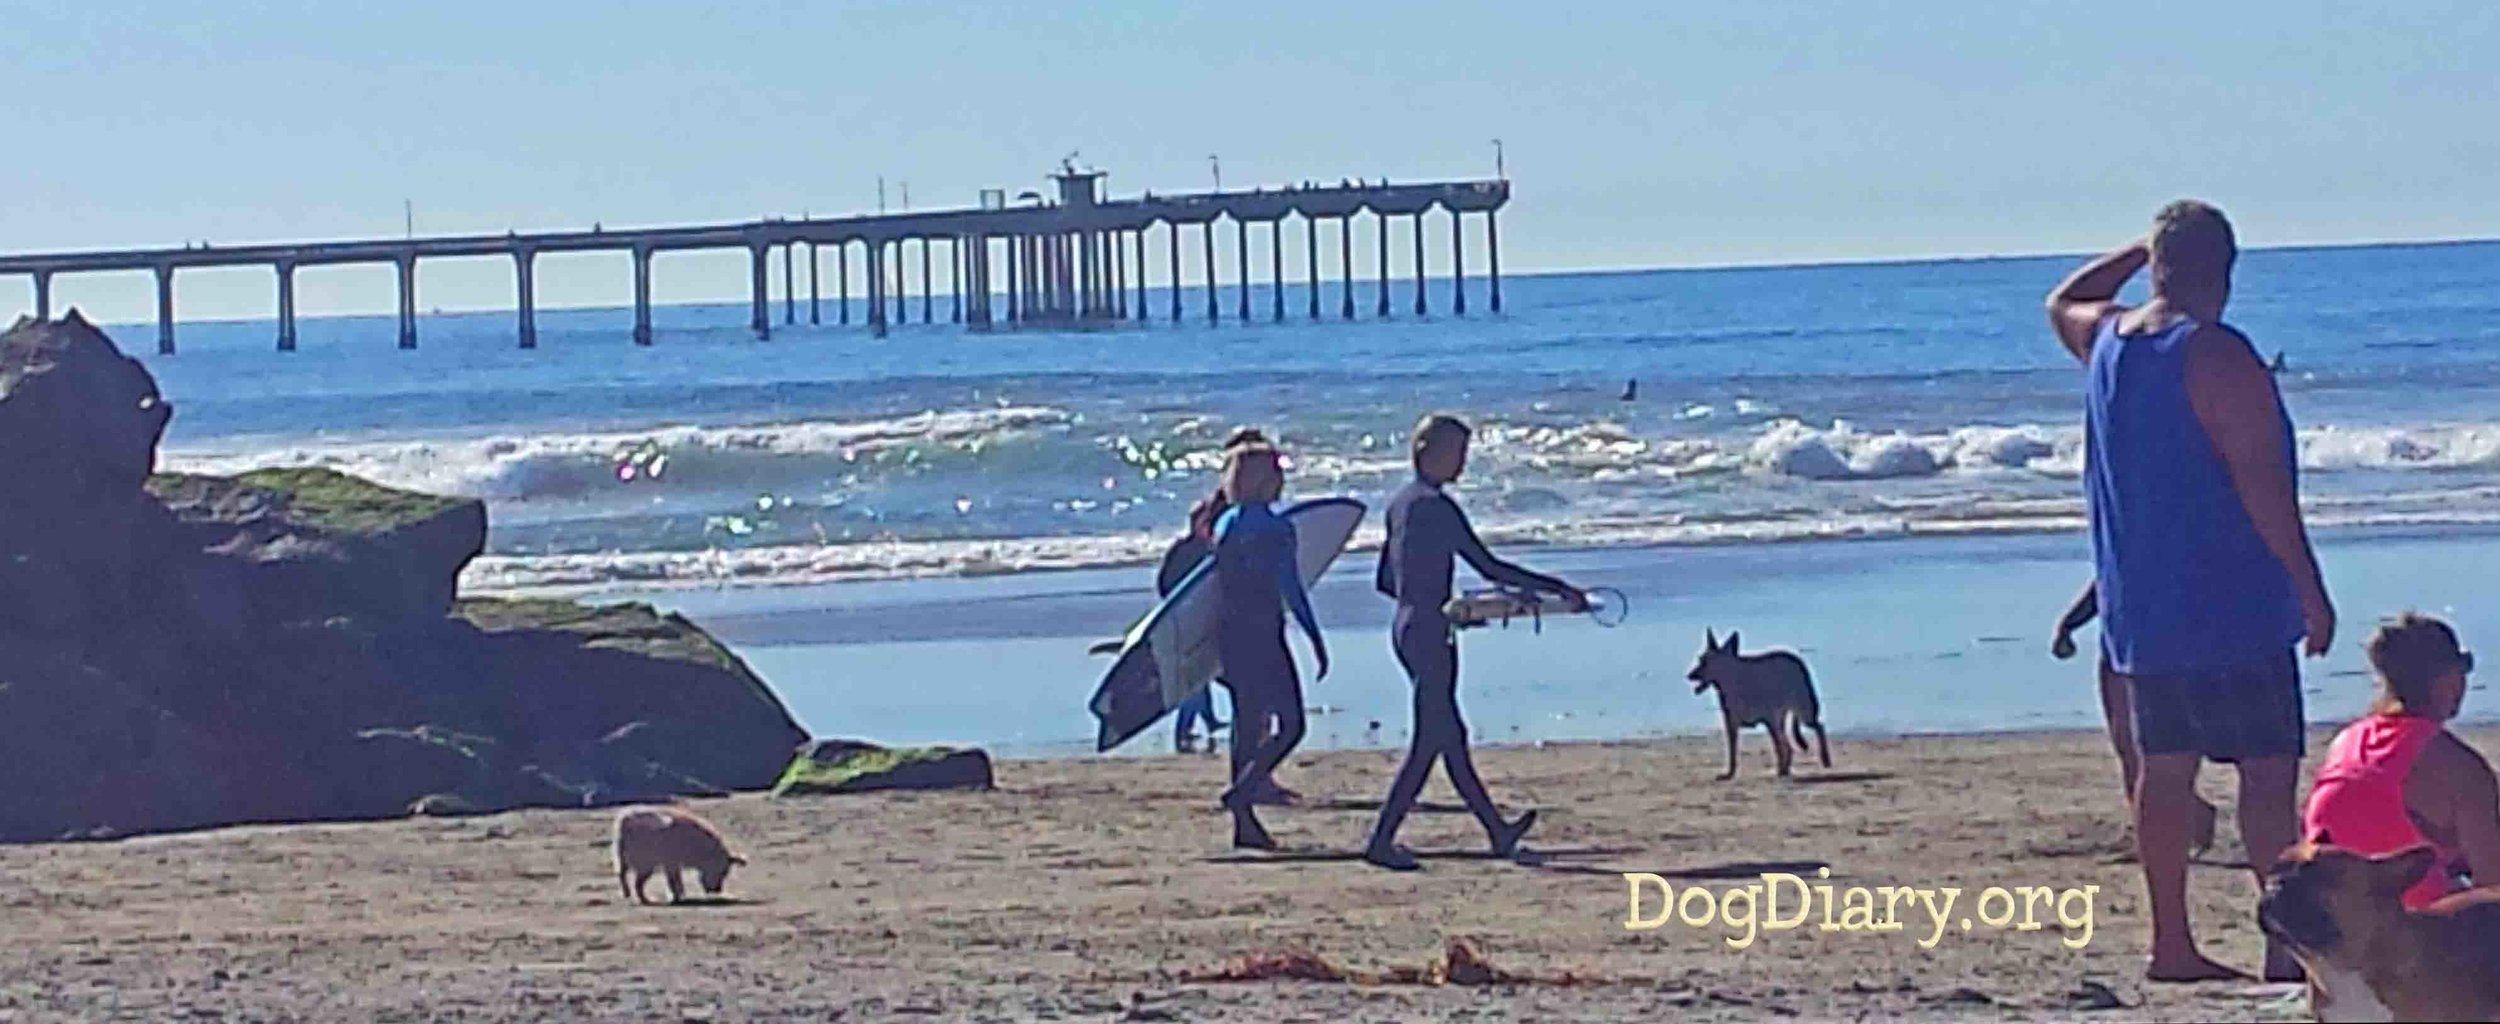 Dog Beach - in Ocean Beach, San Diego, CA. Where the Surf Dog Diaries first began.Photo: (c) Barb Ayers, DogDiary.org